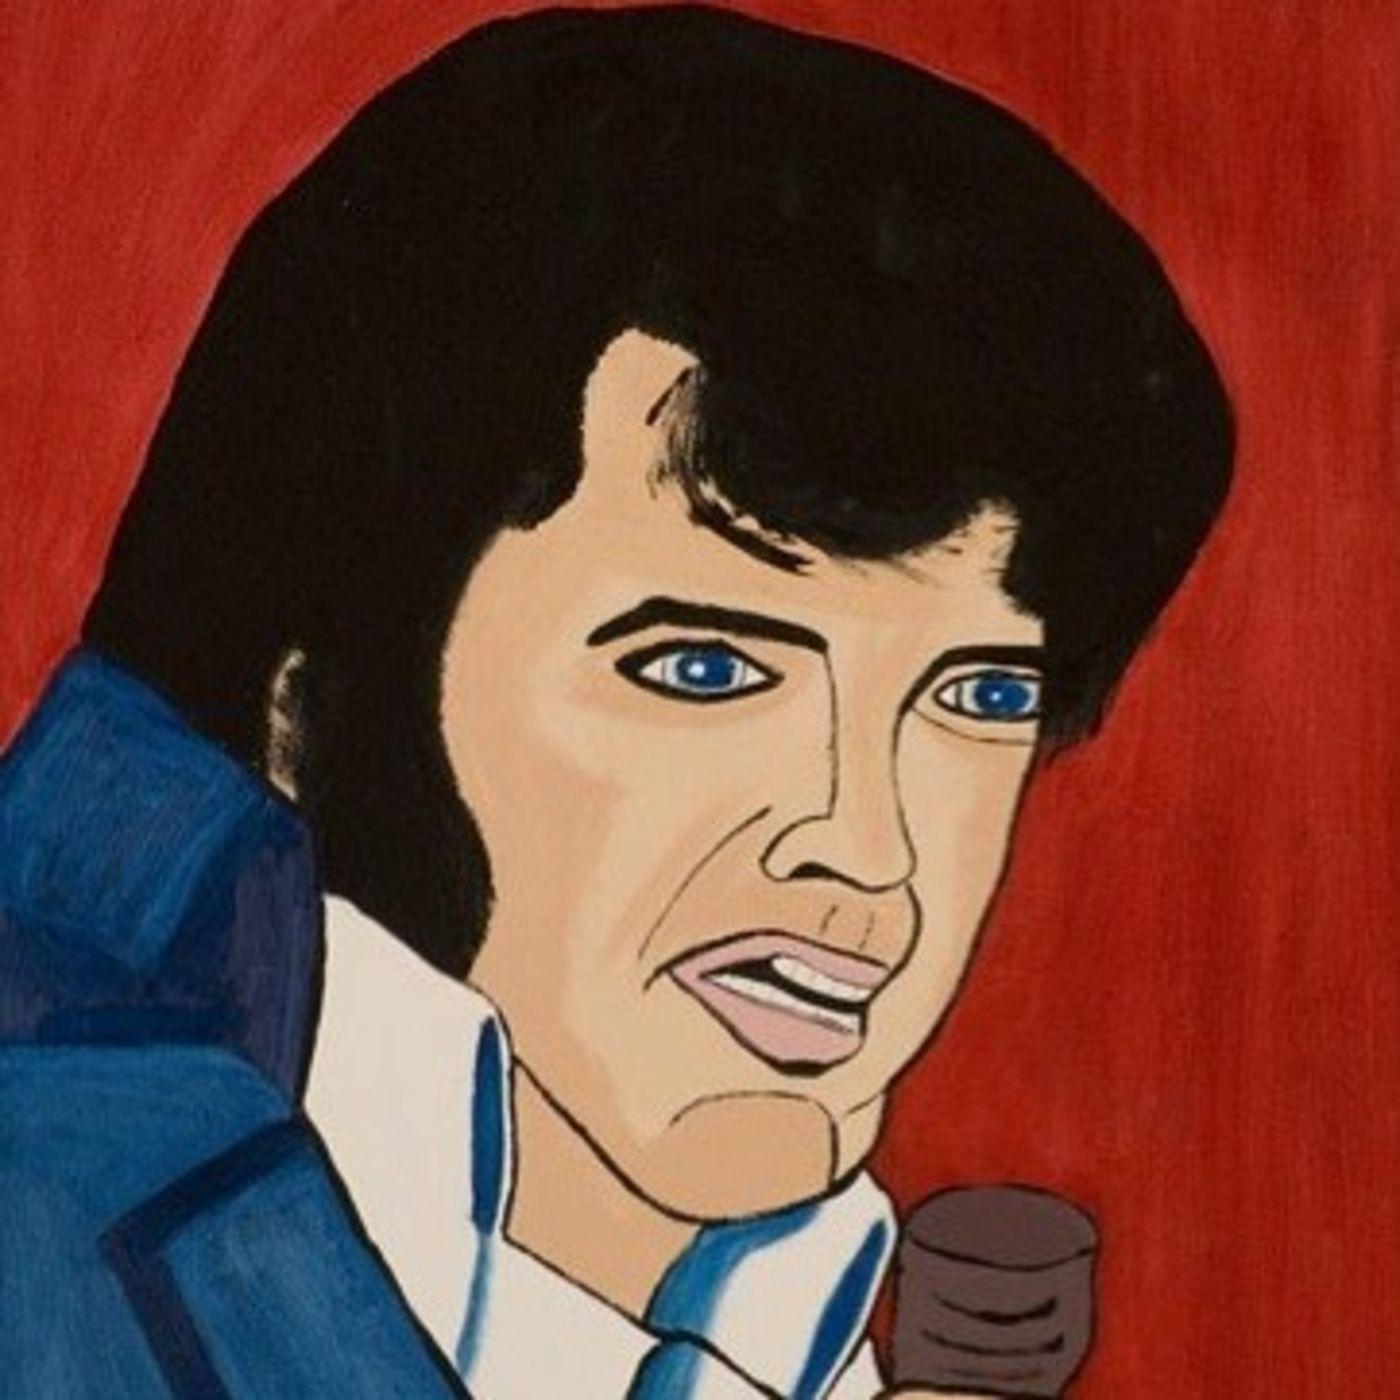 Experiment 034 - ShamWow Death Note: Elvis Ain't Dead